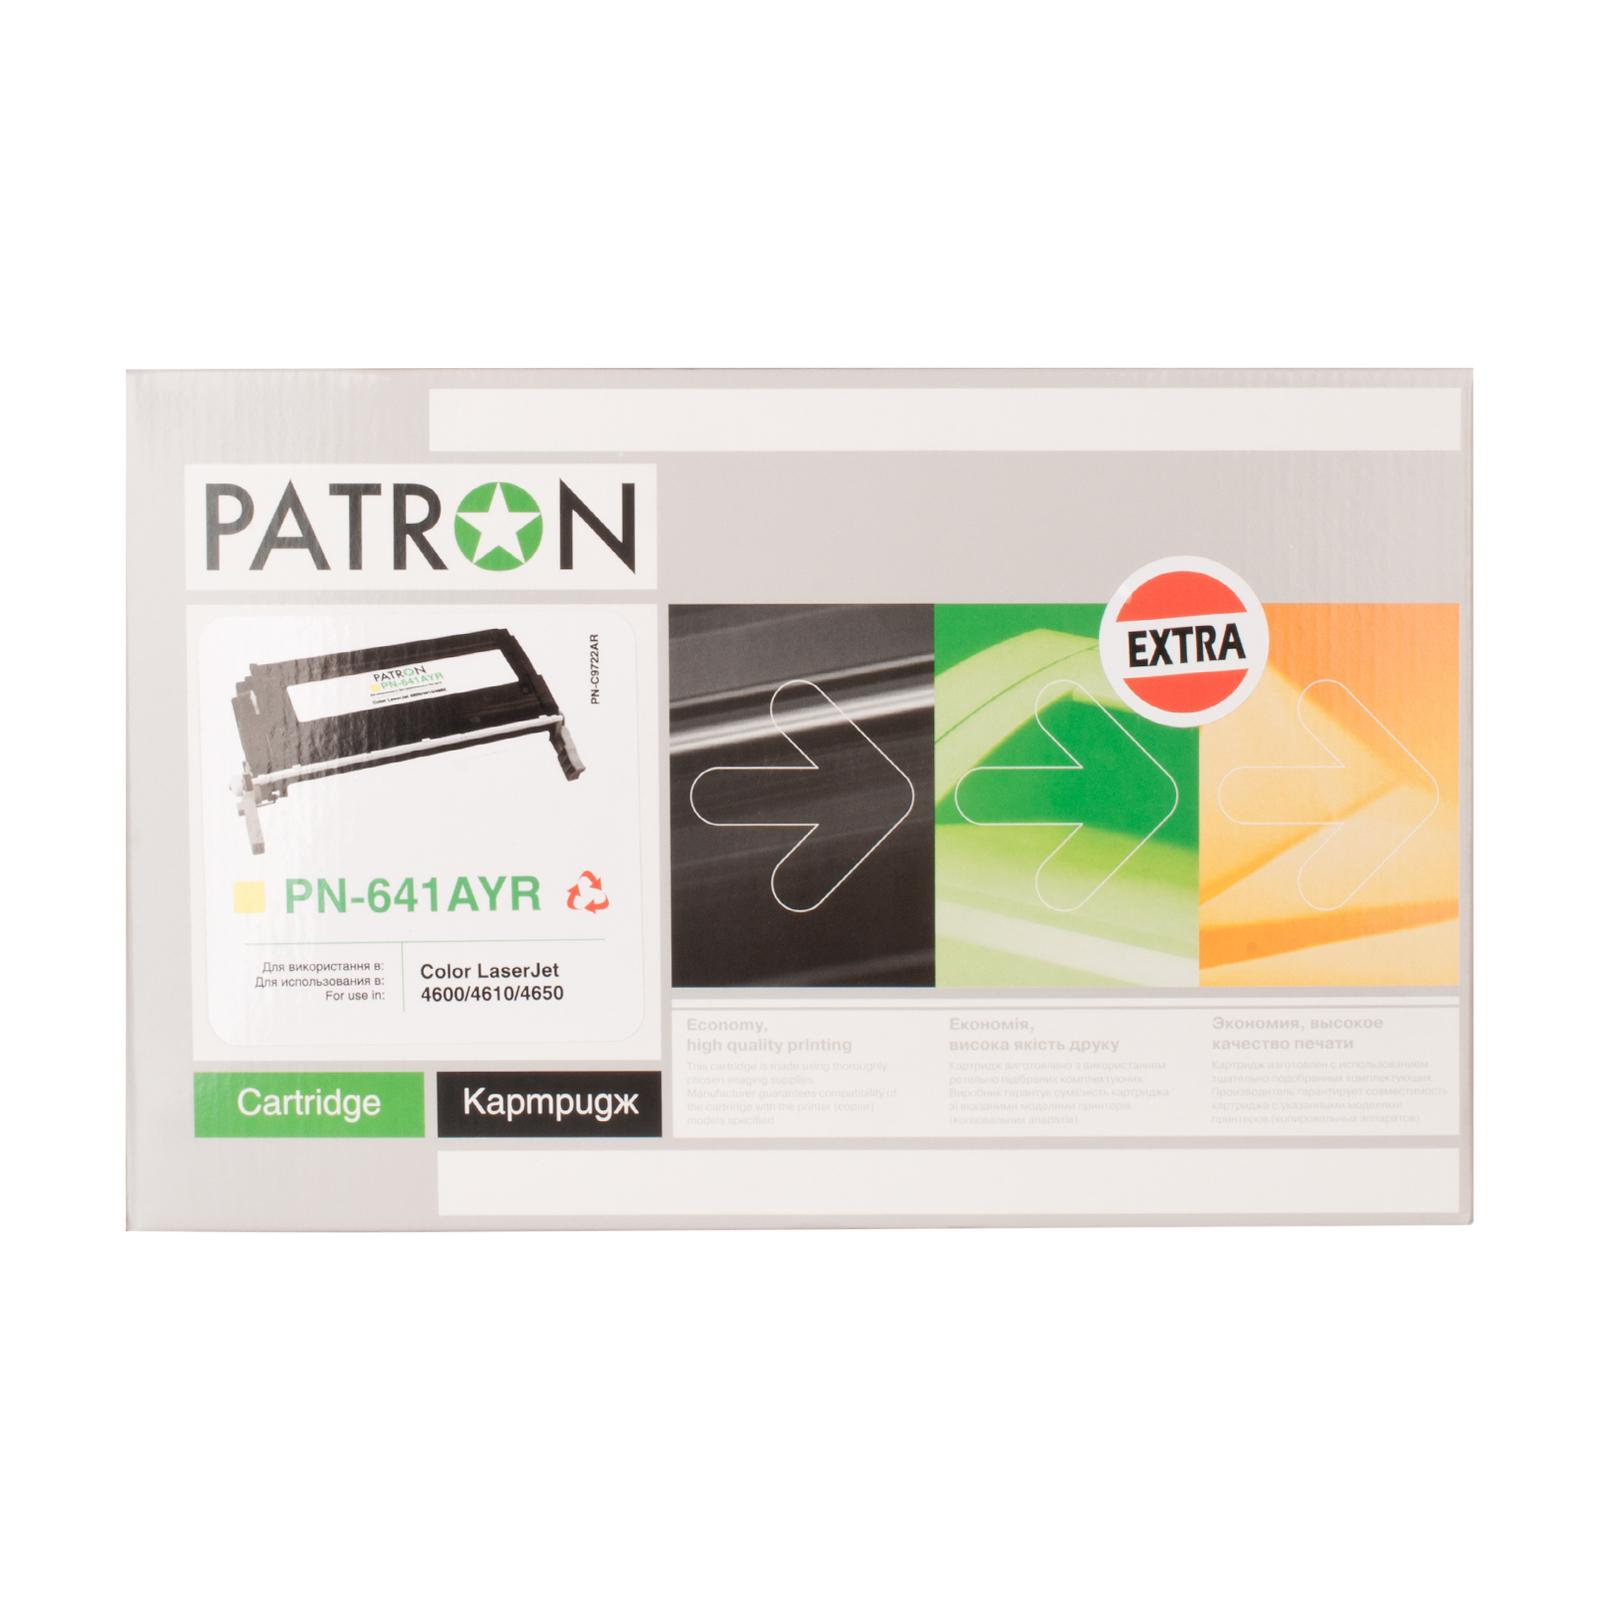 Картридж PATRON HP CLJ 4600 /C9722A (PN-641AYR) YELLOW Extra (CT-HP-C9722A-Y-PN-R) изображение 2